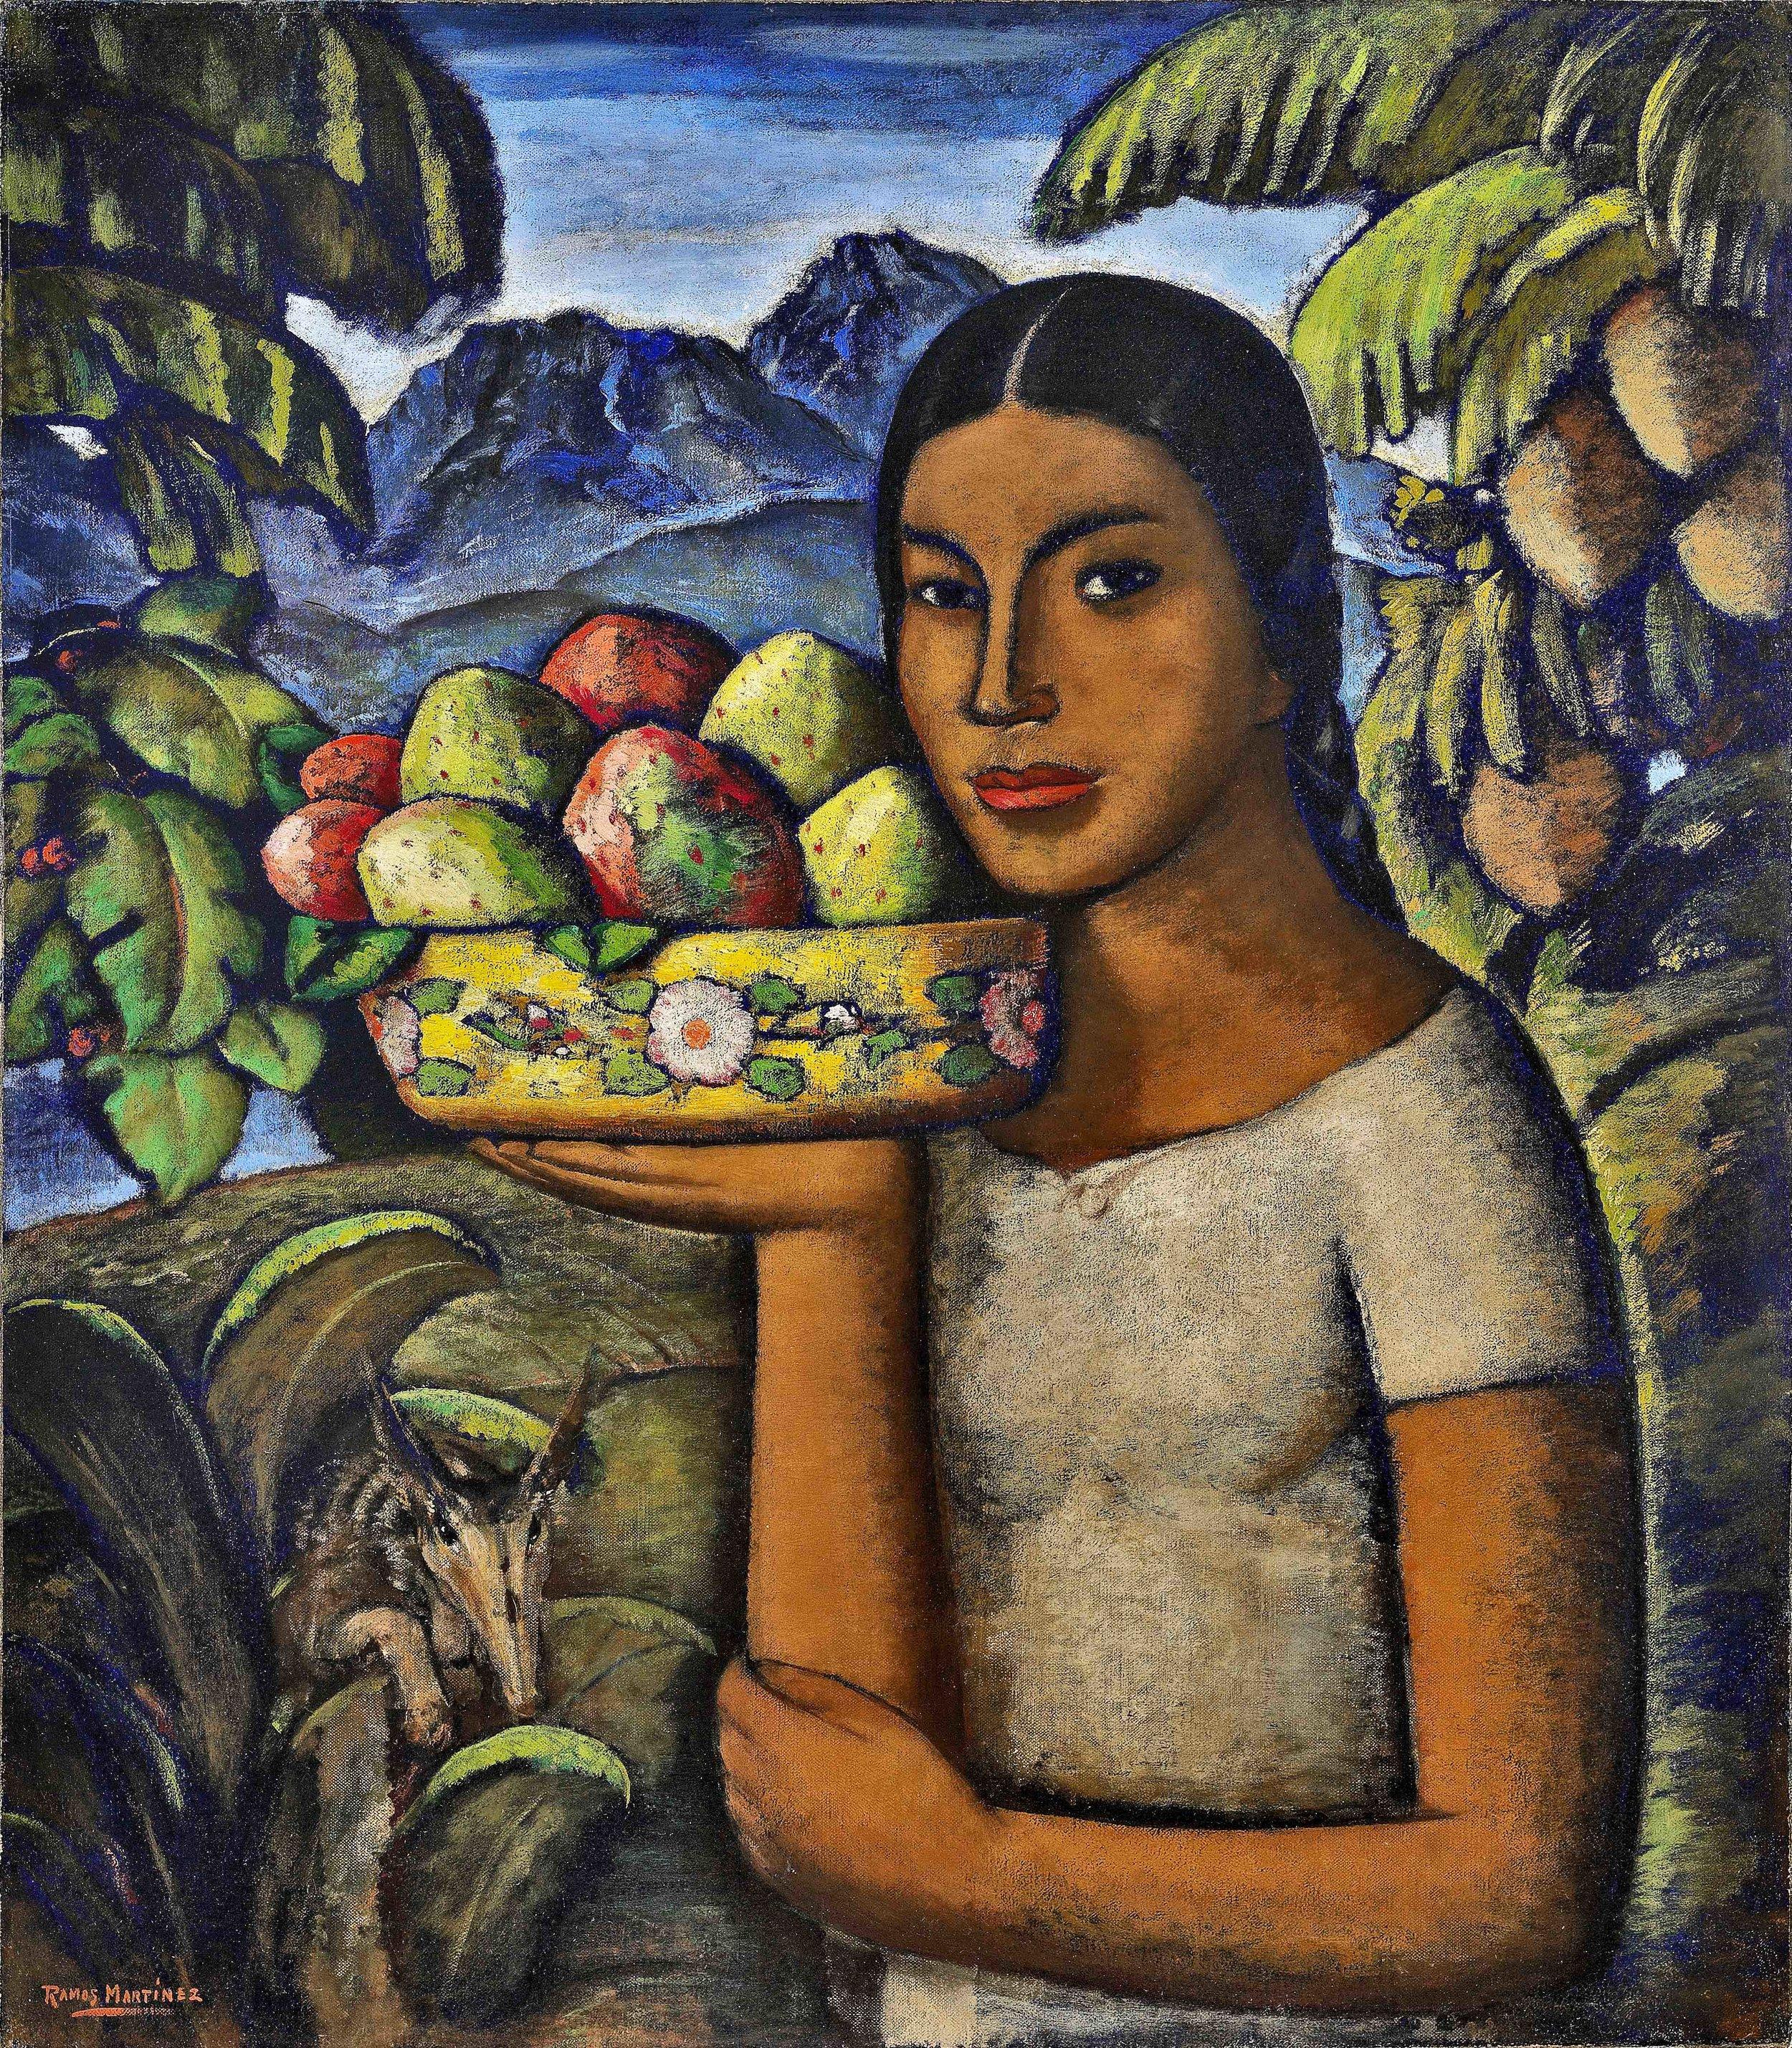 Mujer con Tunas / Woman with Prickly Pears  ca. 1934 oil on canvas / óleo sobre tela 32 x 28 inches; 81.3 x 71.1 centímetros